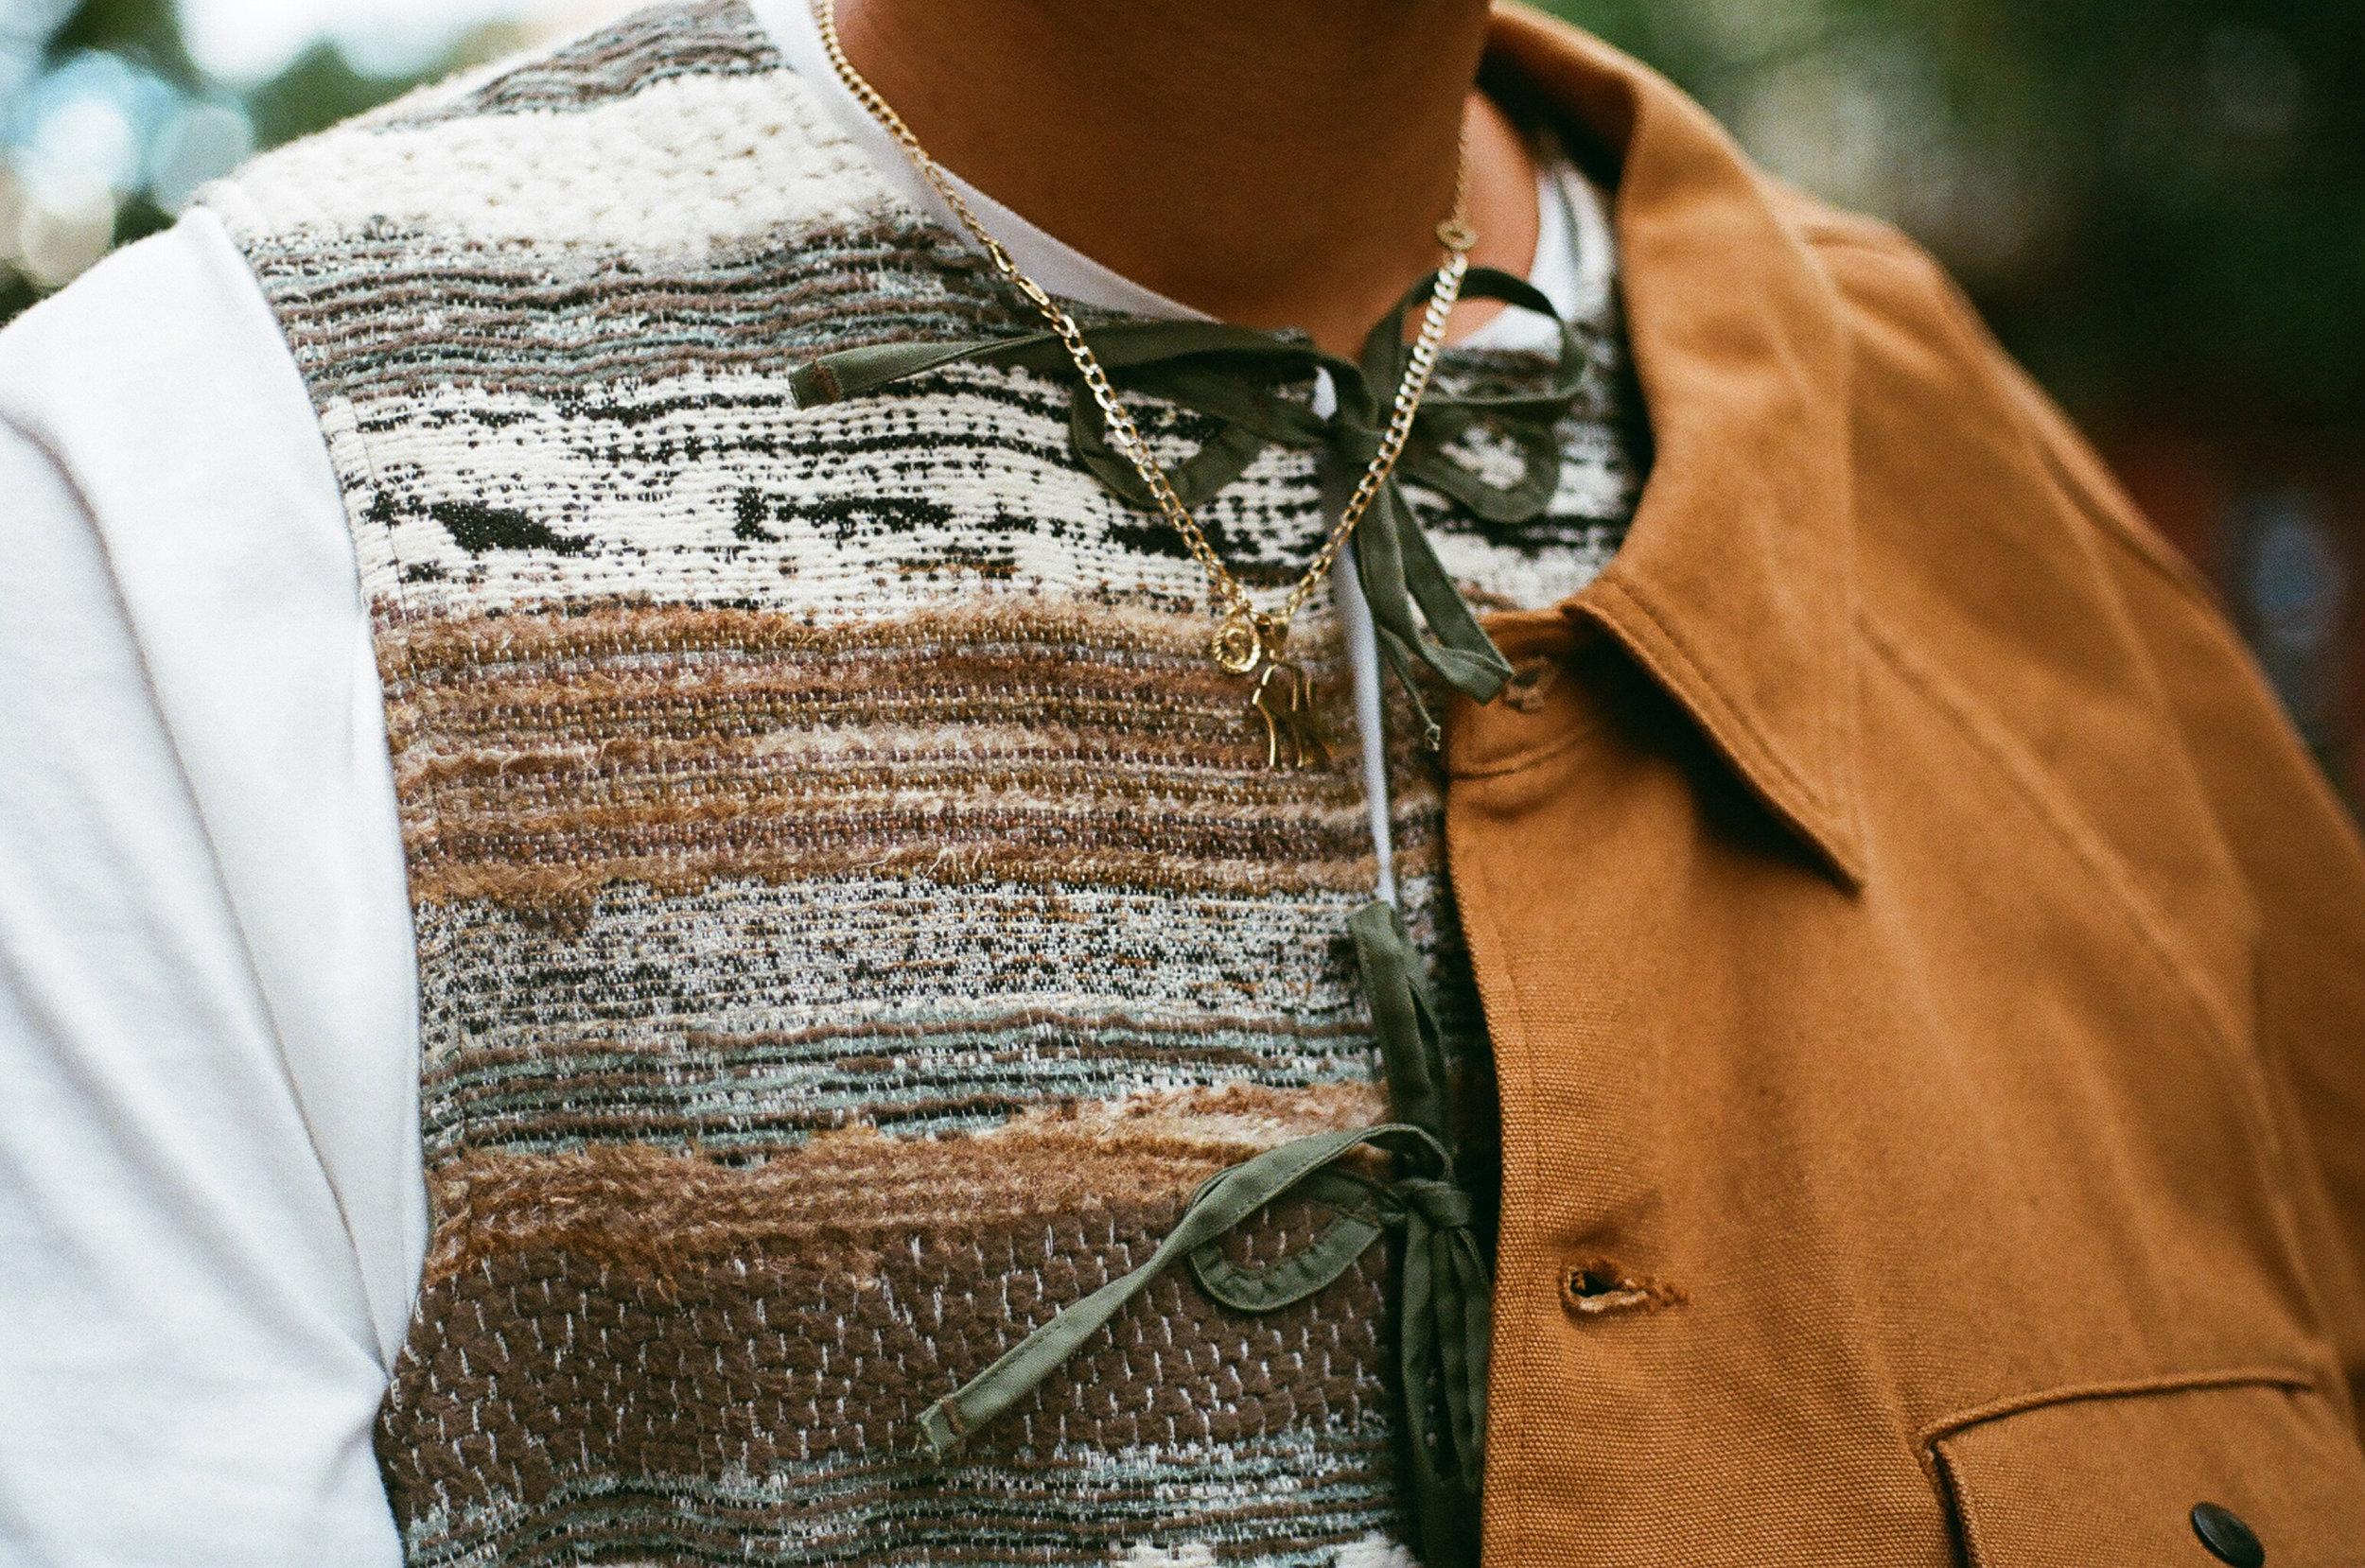 Gardening Jacket Cincho Vest Dropcrotch Velvet Pants Maine Guide 6 Eye DB Boots